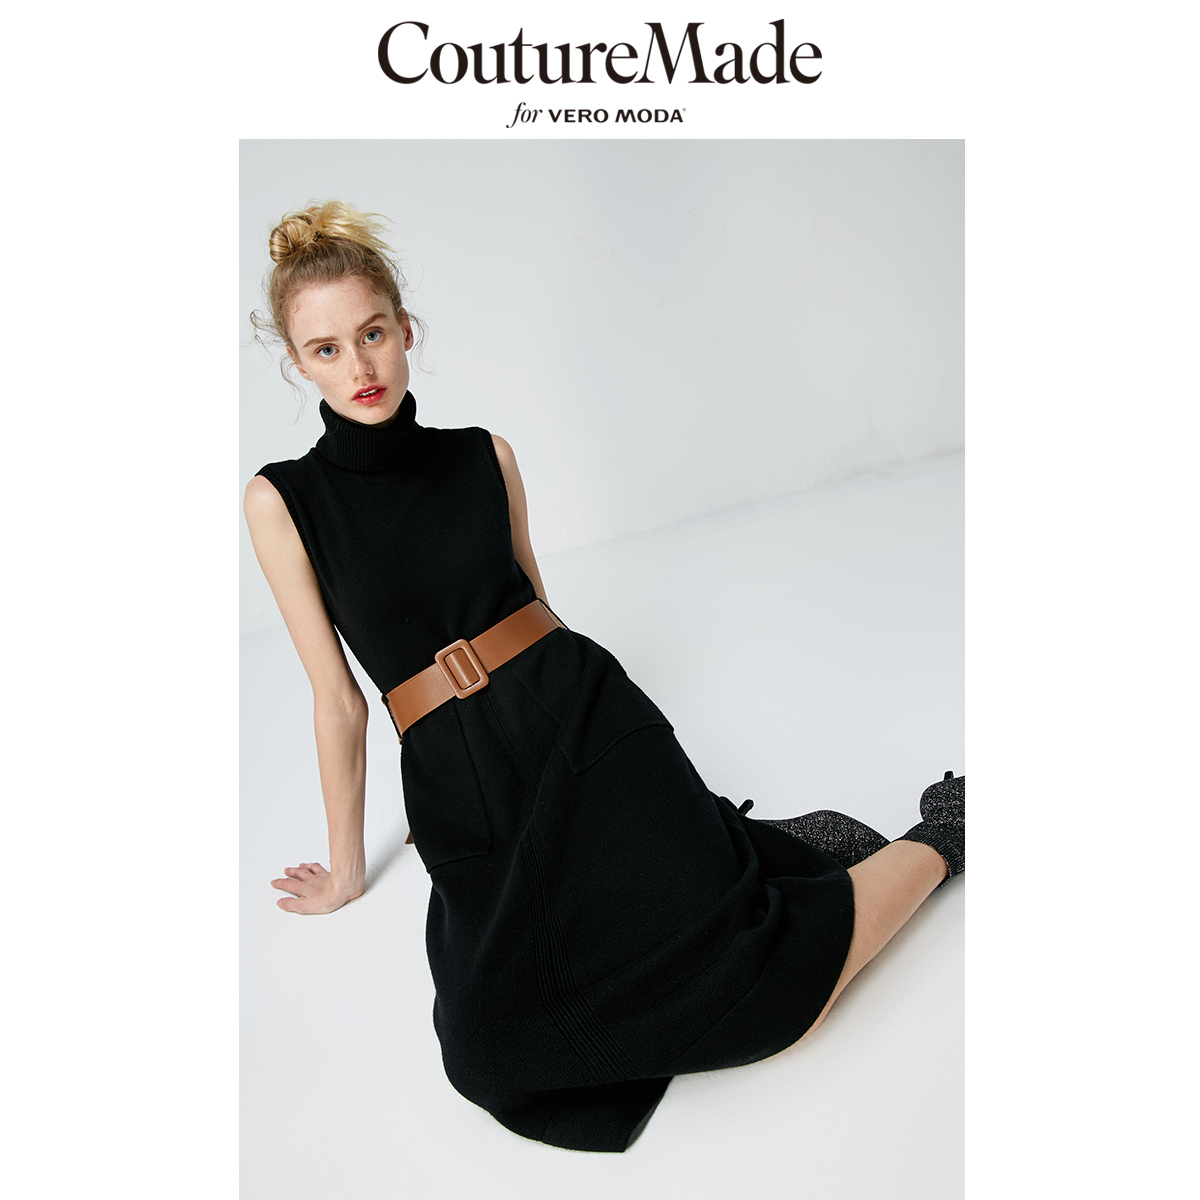 Vero Moda Women's Couturemade High Neck Knitted Sleeveless Medium Length Party Dress | 319146513